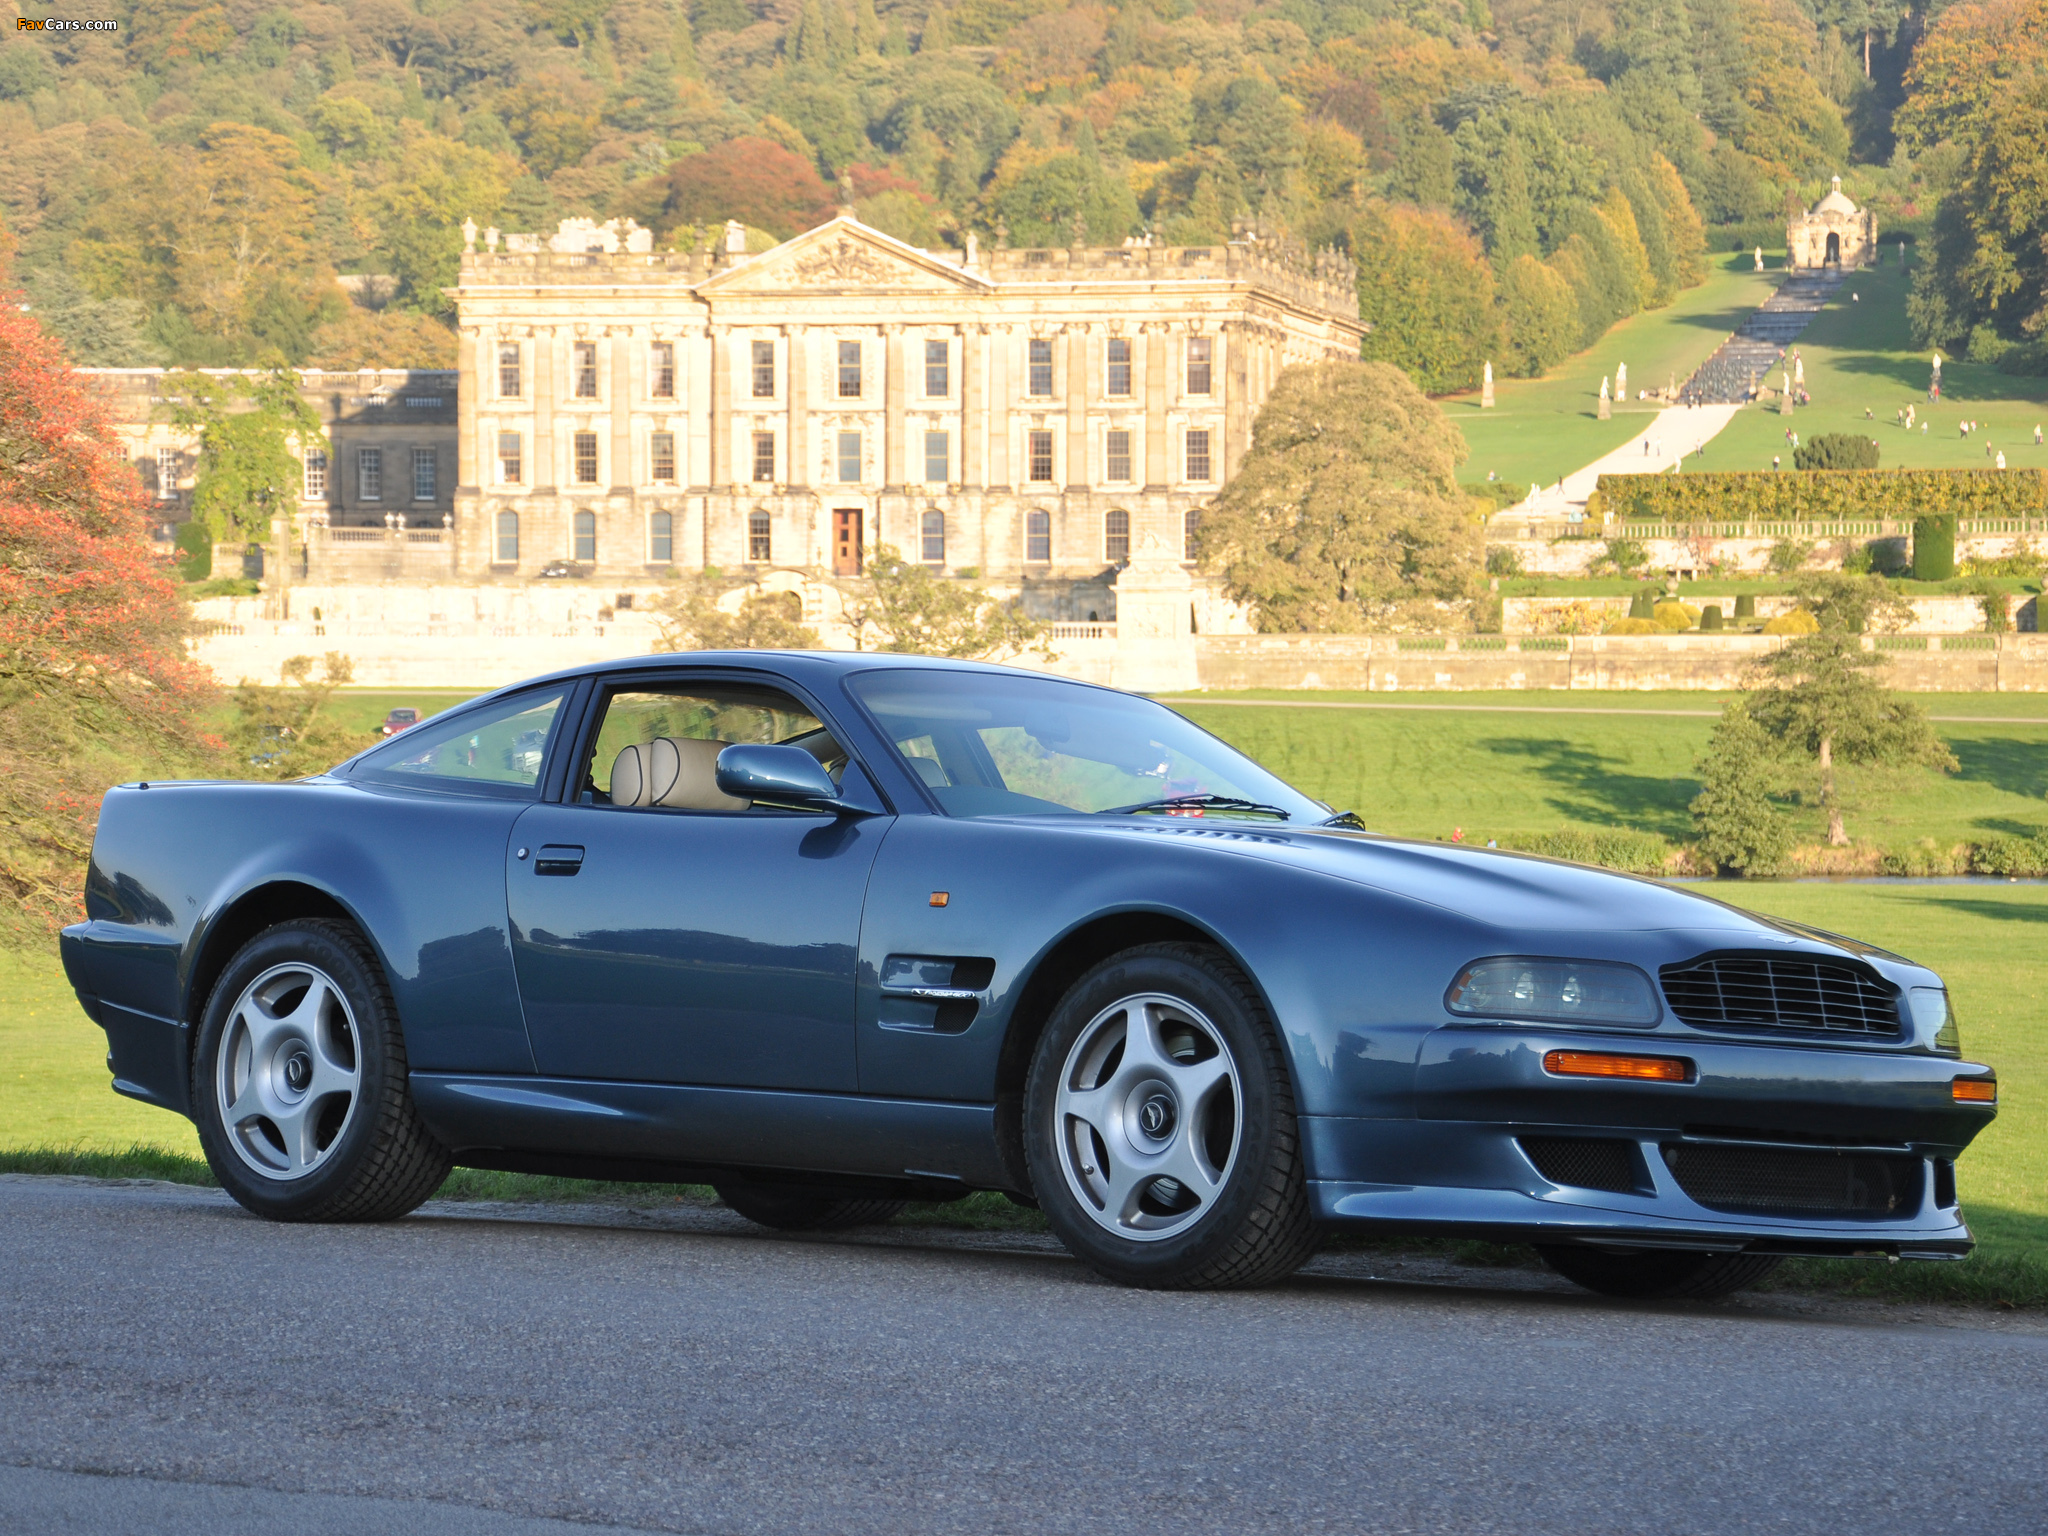 Images Of Aston Martin V8 Vantage V600 1998 2000 2048x1536